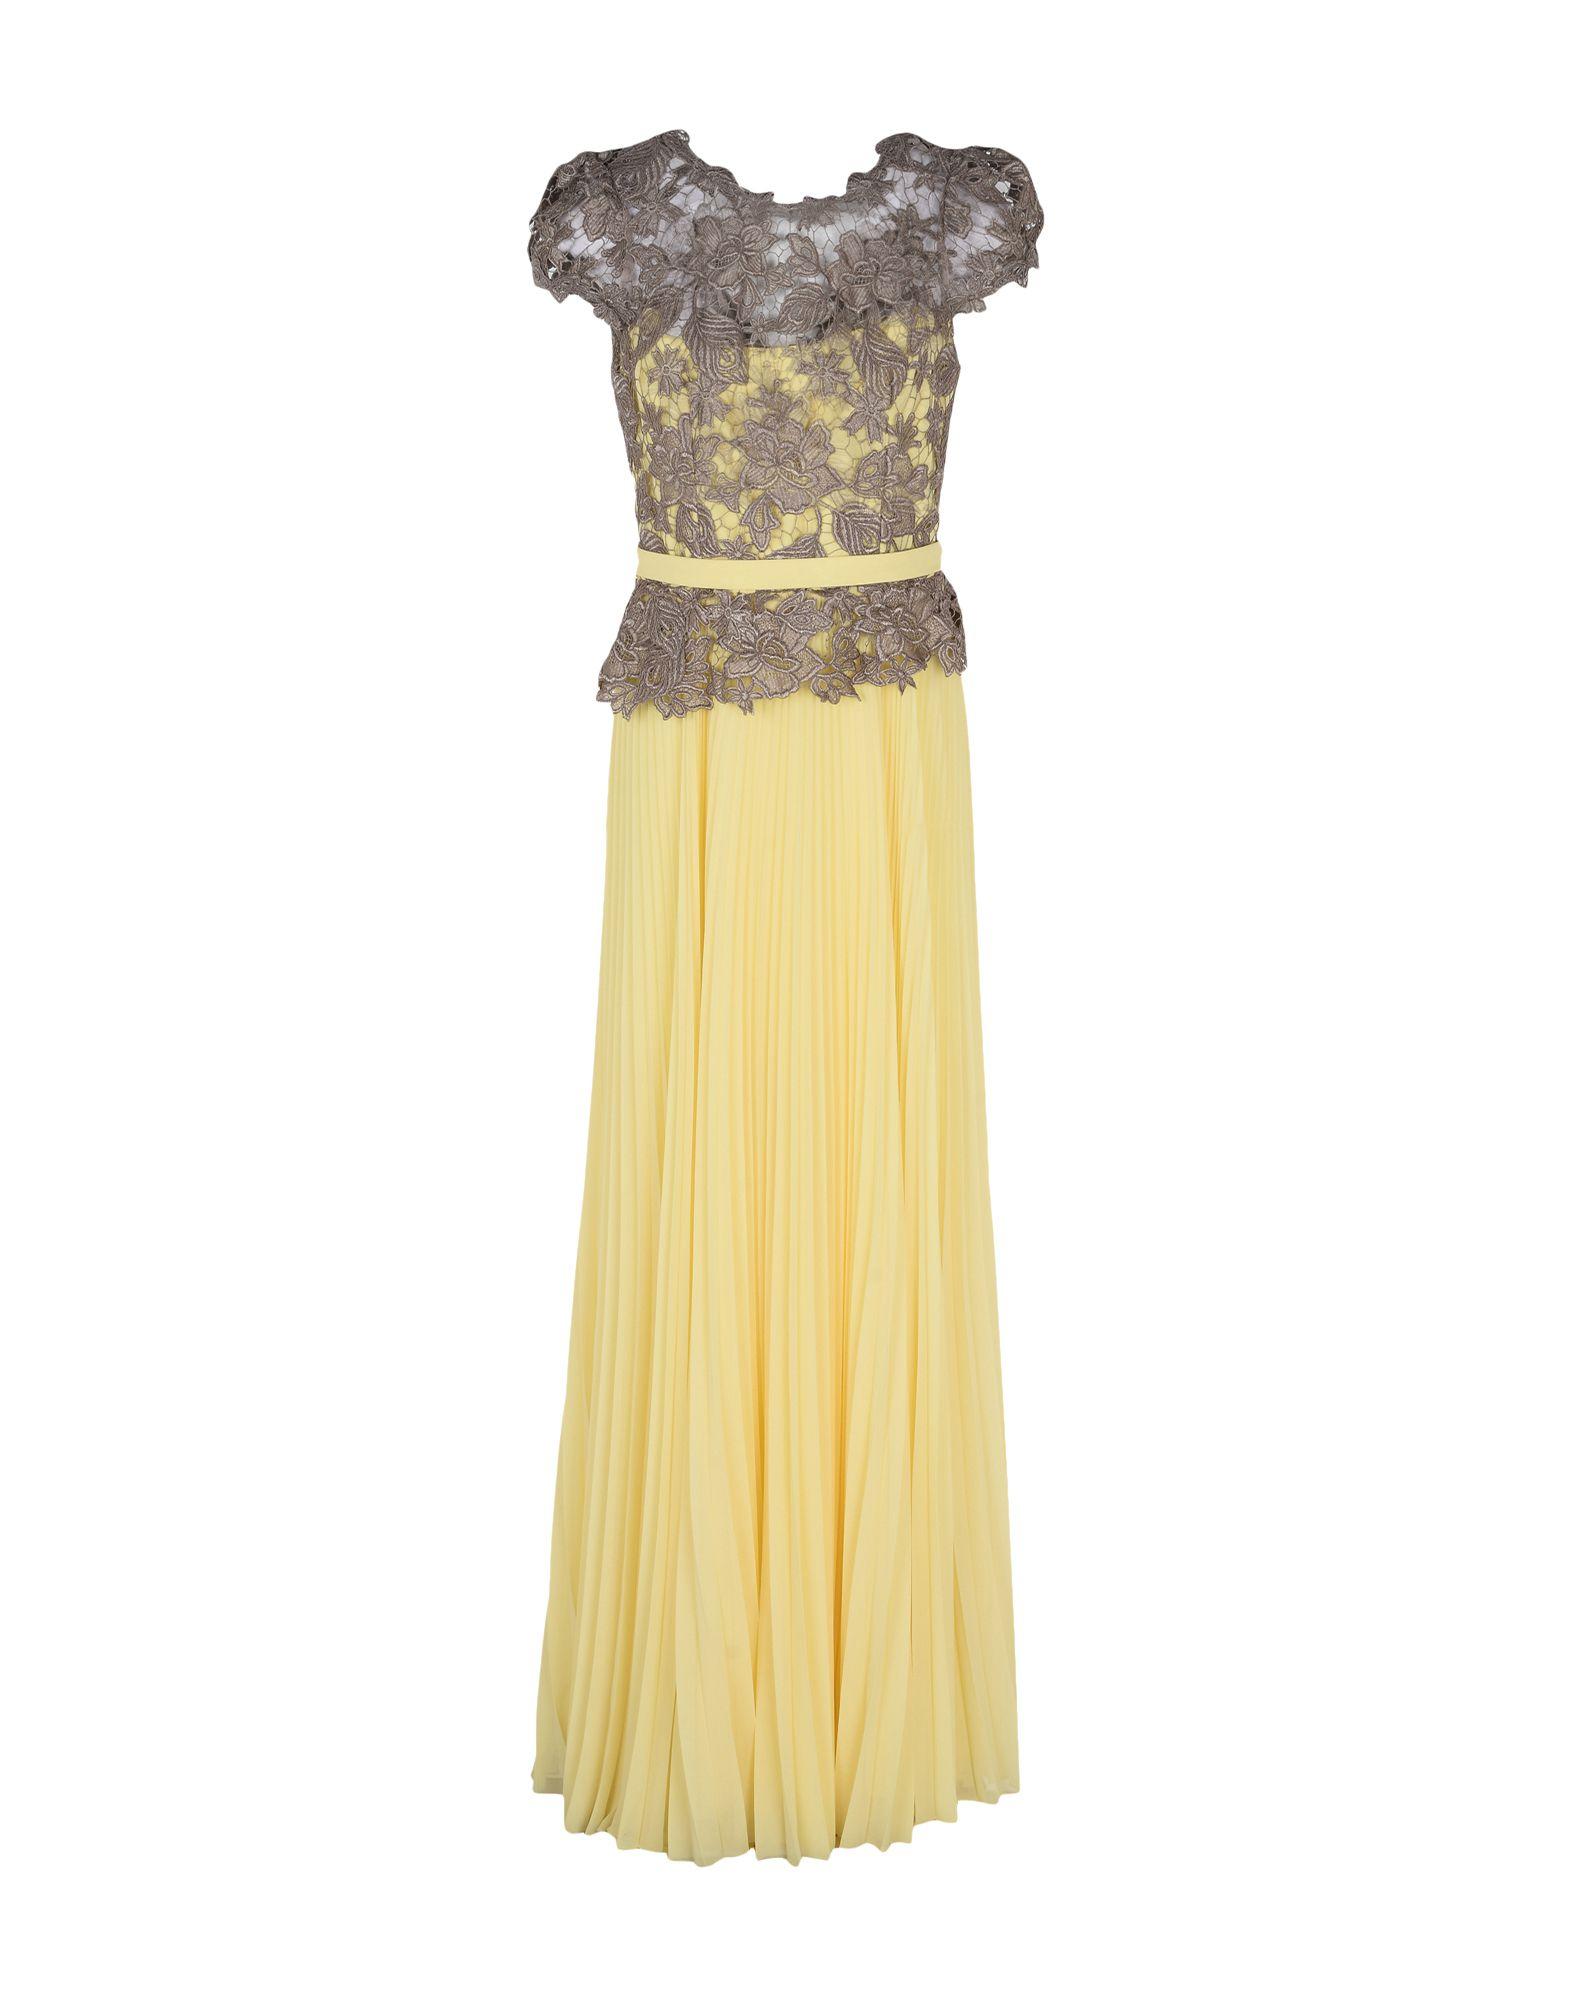 5b30df844c63 MAESTRI - Γυναικεία Φορέματα